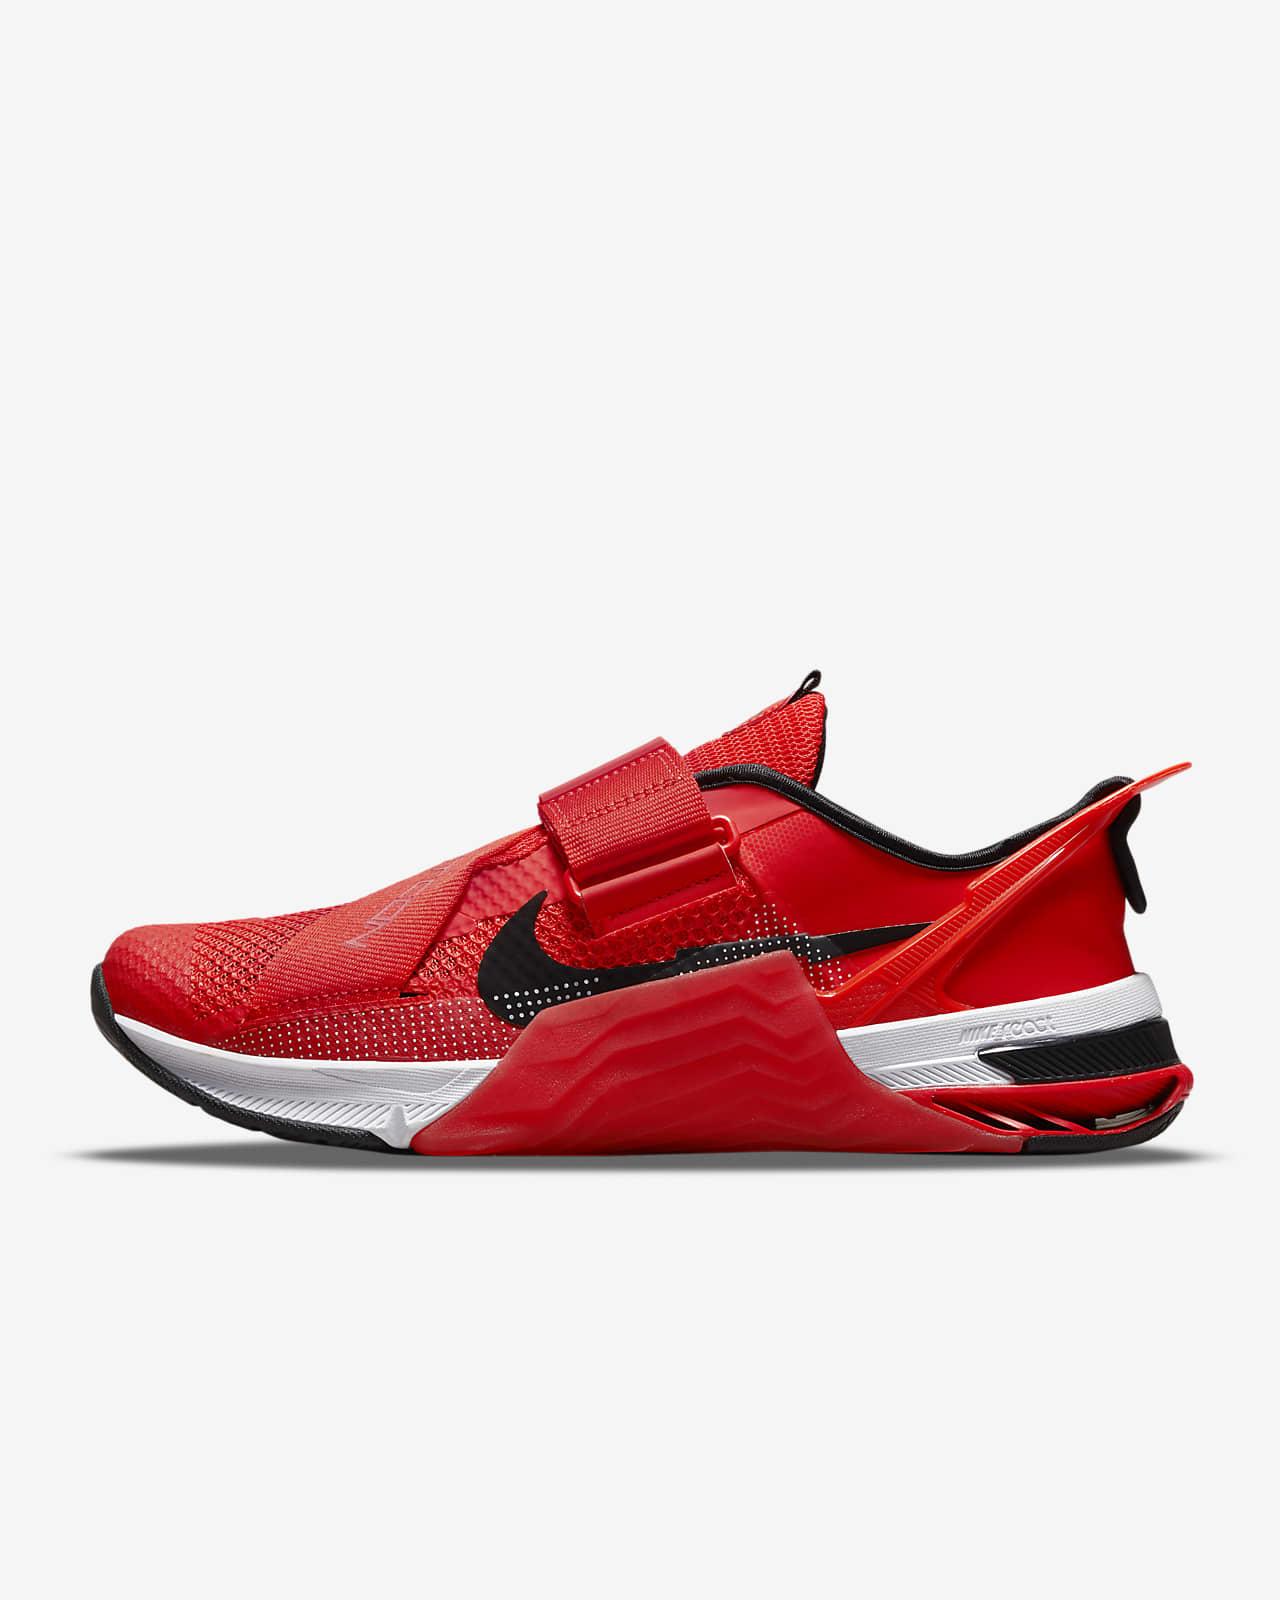 Chaussure de training Nike Metcon7 FlyEase